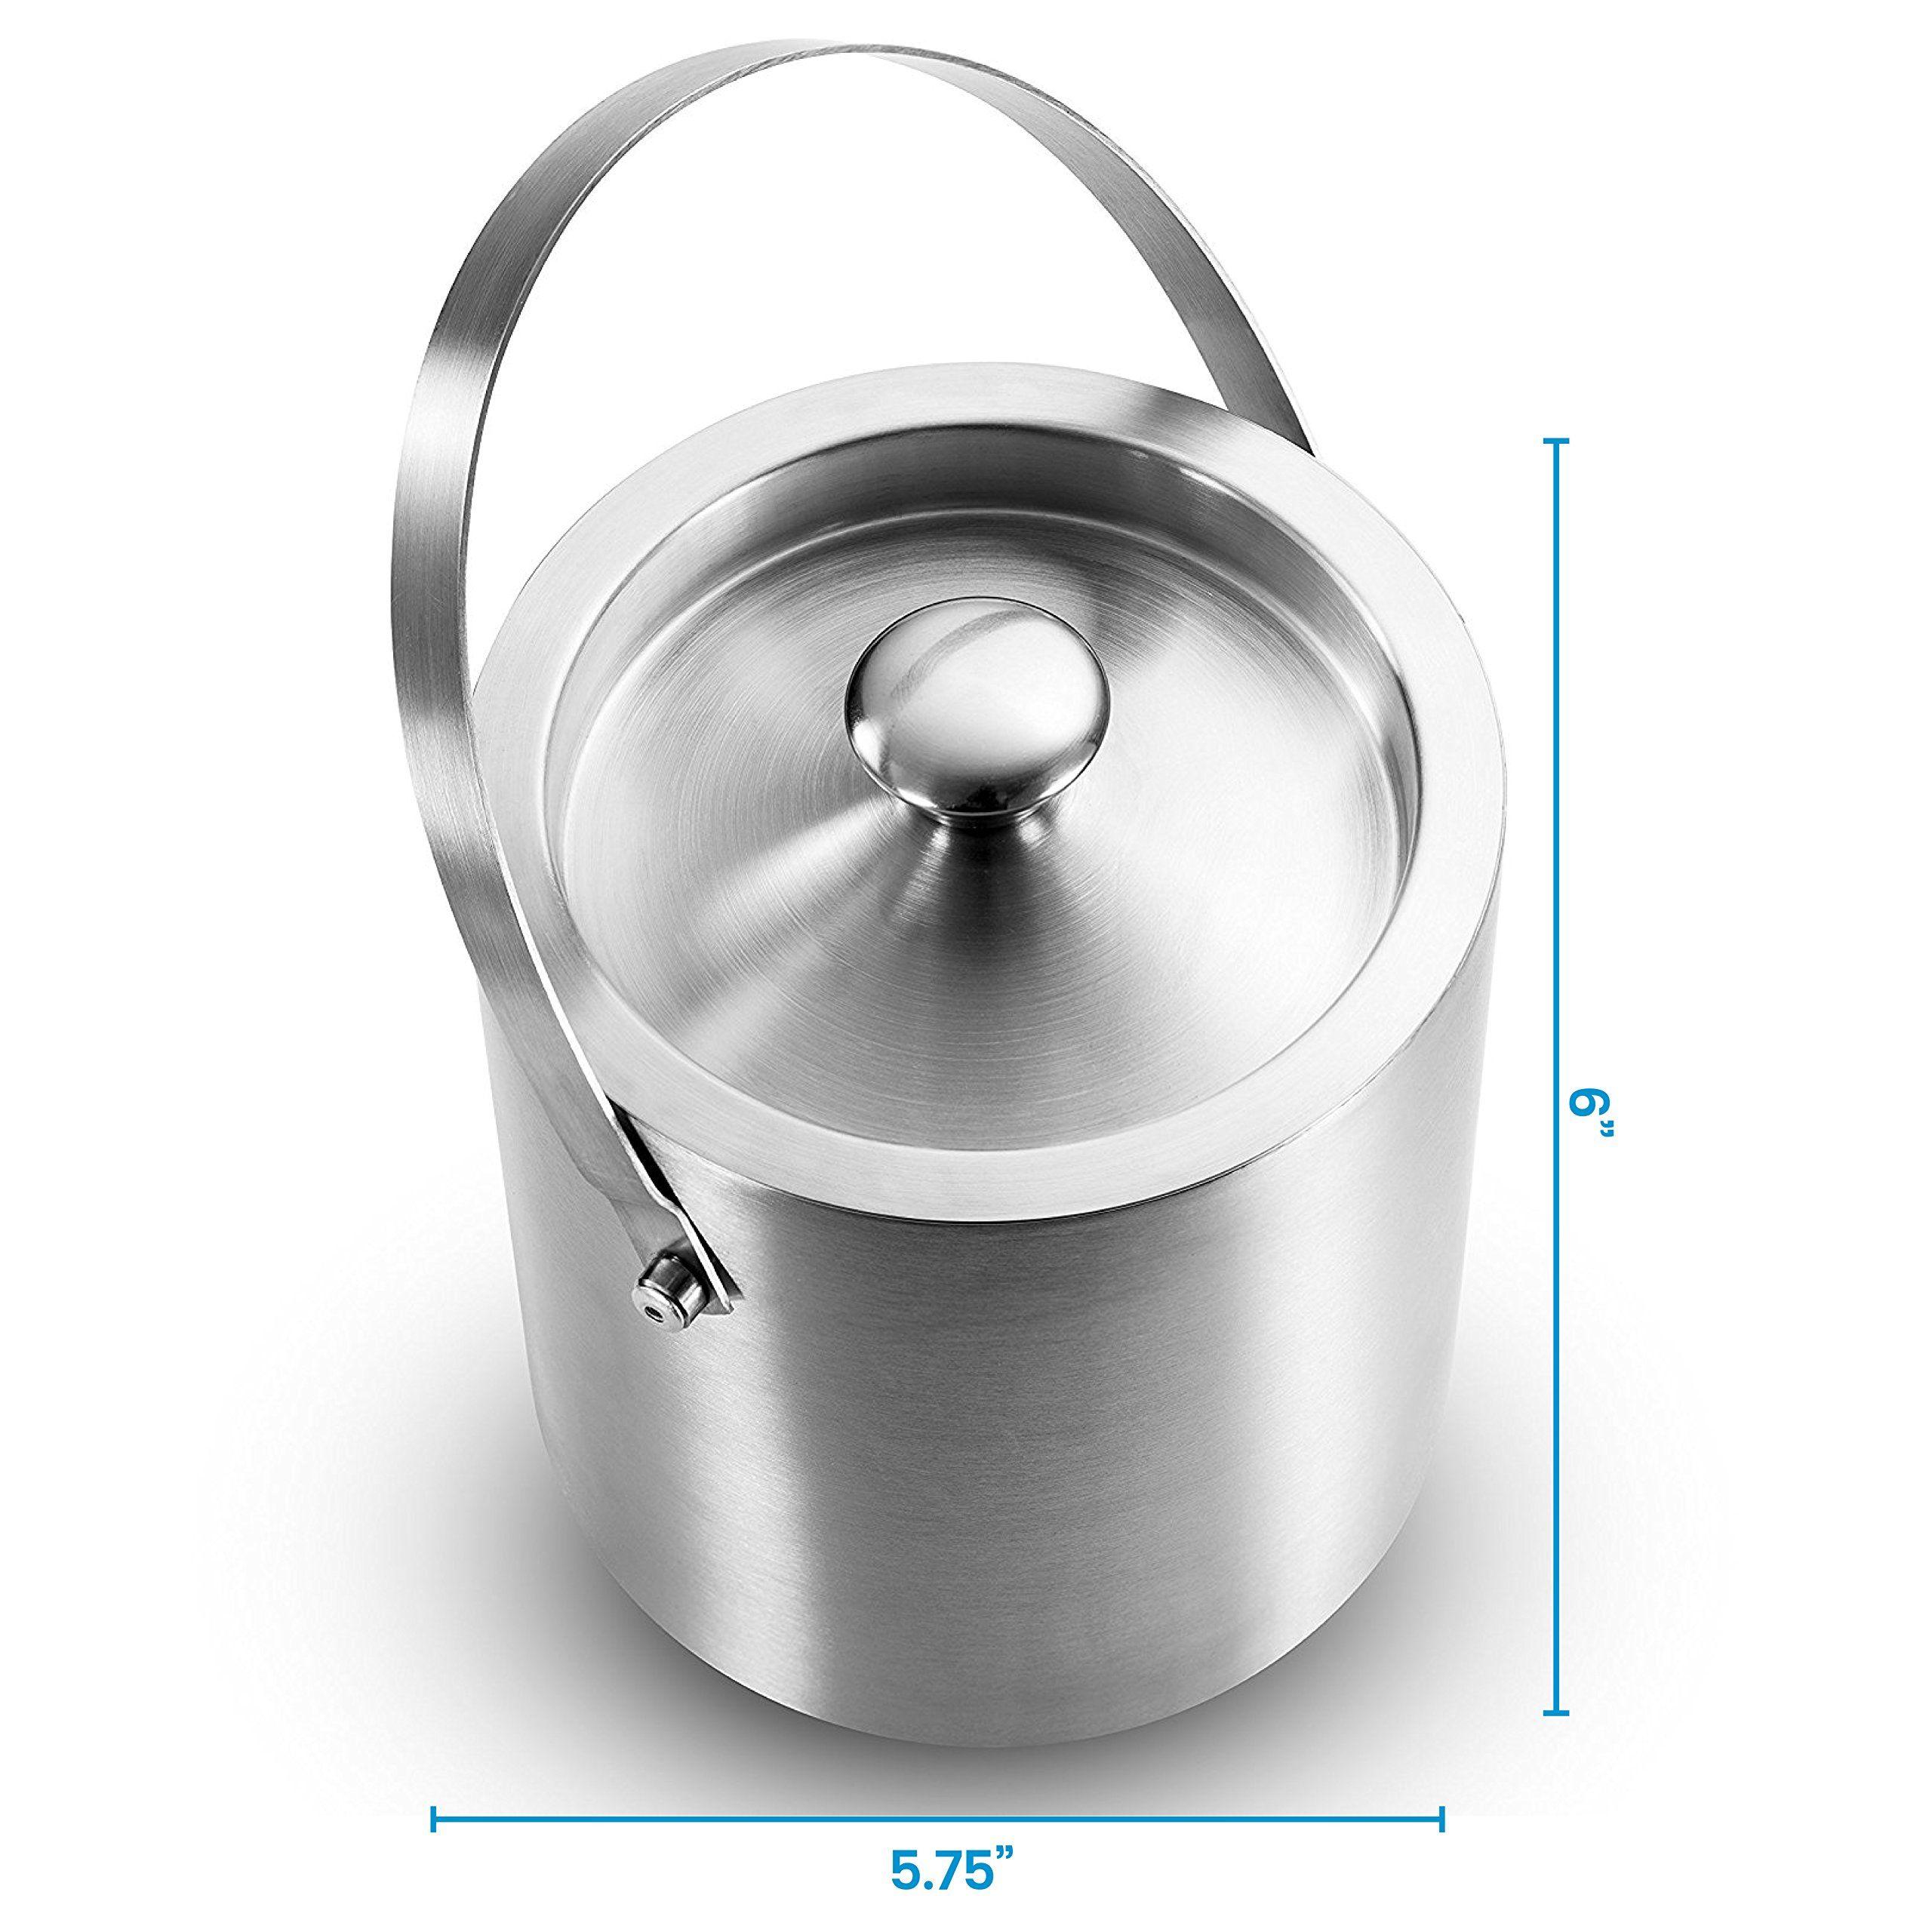 Finedine Brushed Stainless Steel Doublewalled Ice Bucket With Lid Compact Heavyduty Metal Ice Bucket With Handle Wine And Liquor Liquor Bottles Bucket With Lid